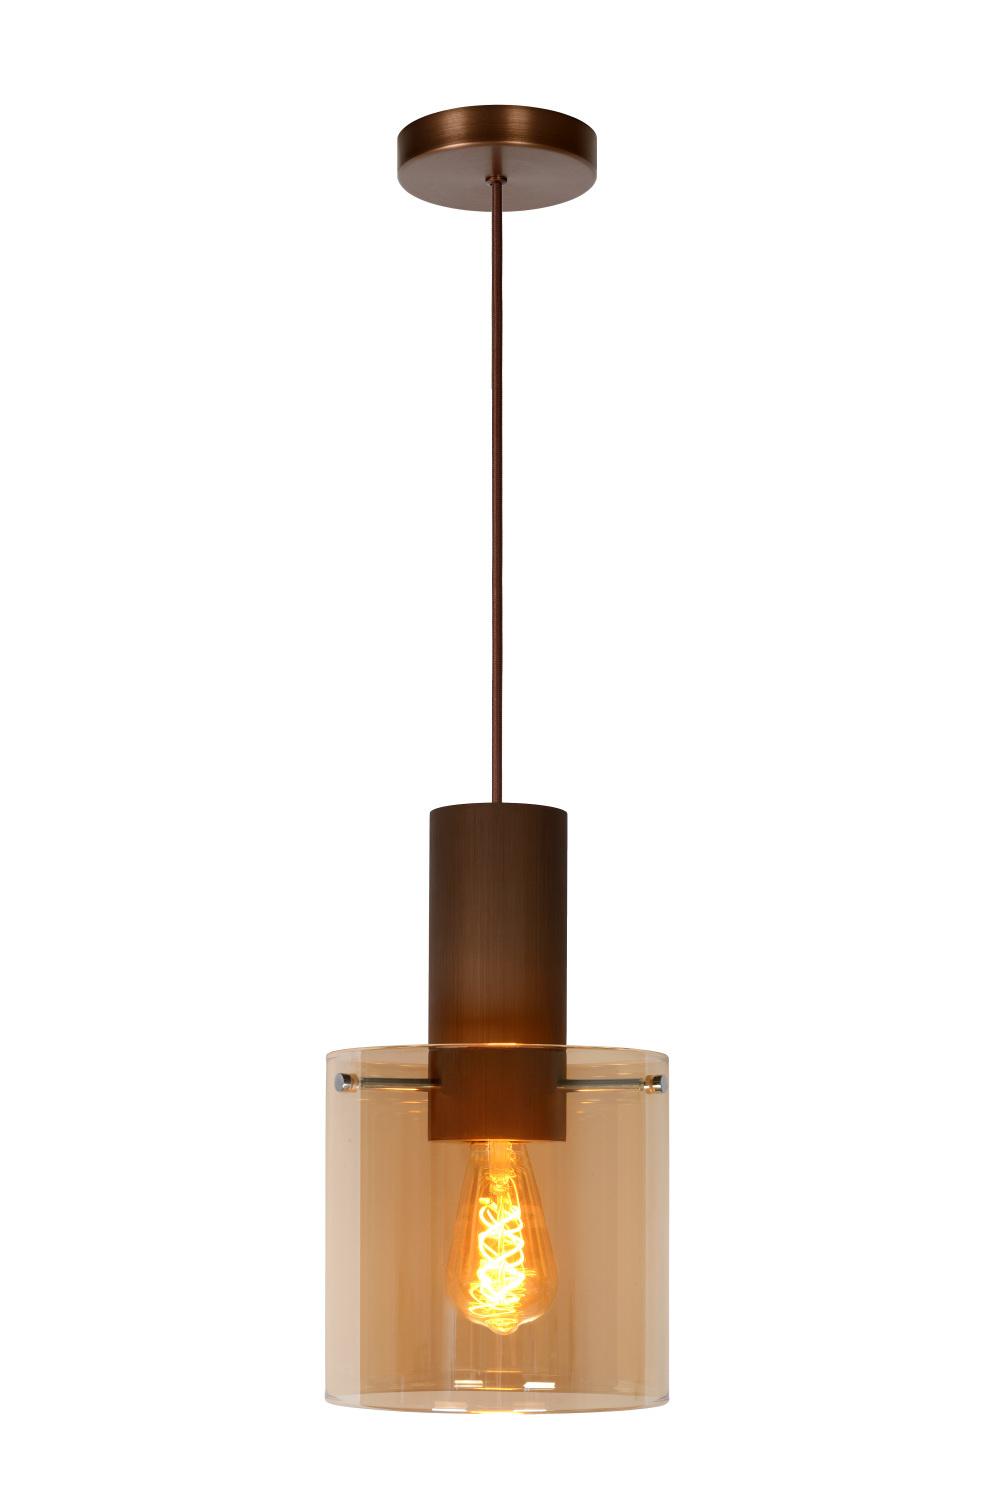 Lucide TOLEDO Hanglamp-Amber-Ø20-1xE27-40W-Glas